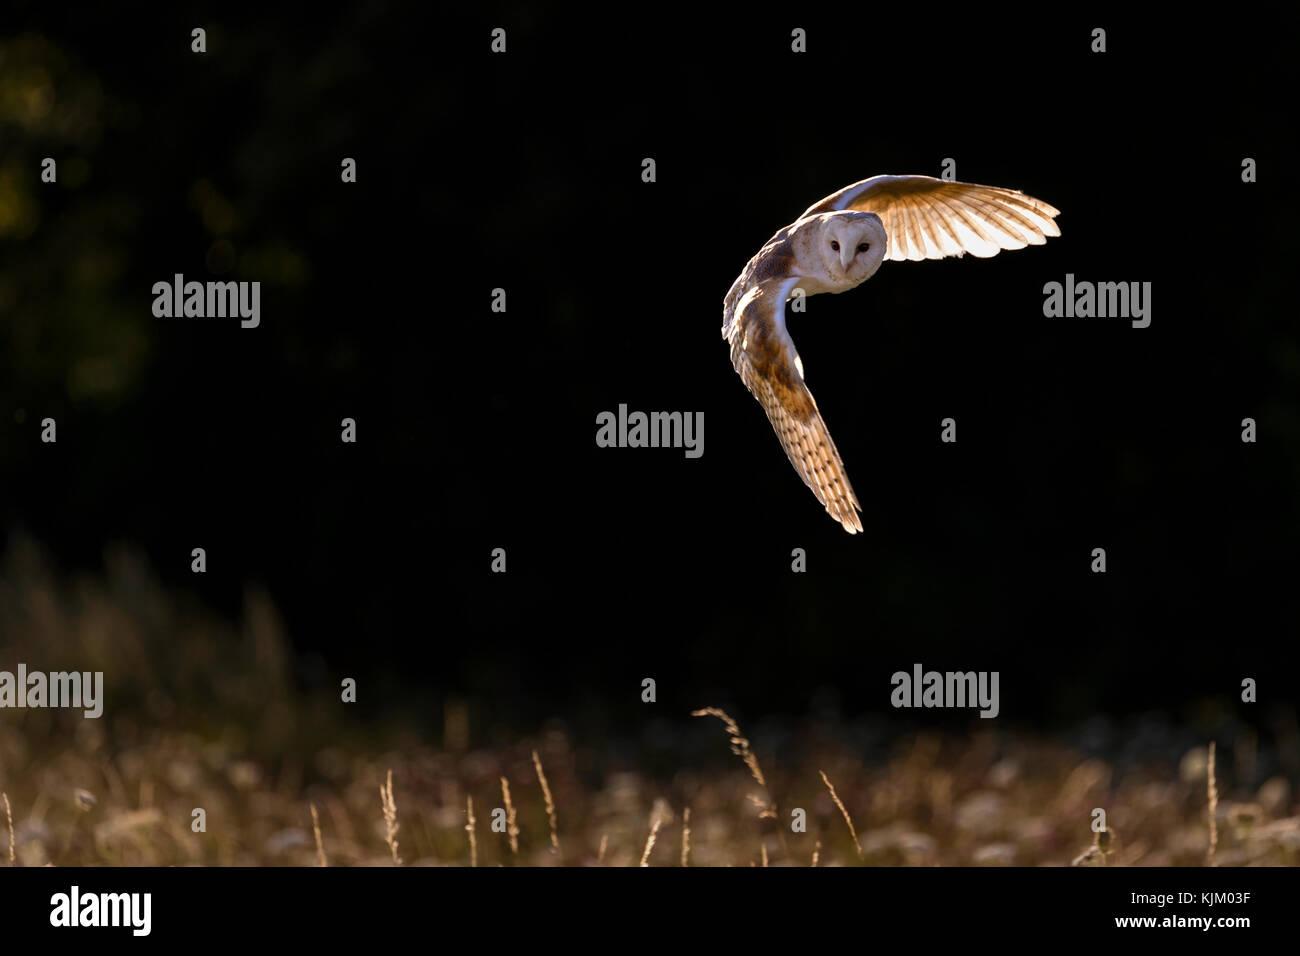 Barn owl in flight, backlit - Stock Image